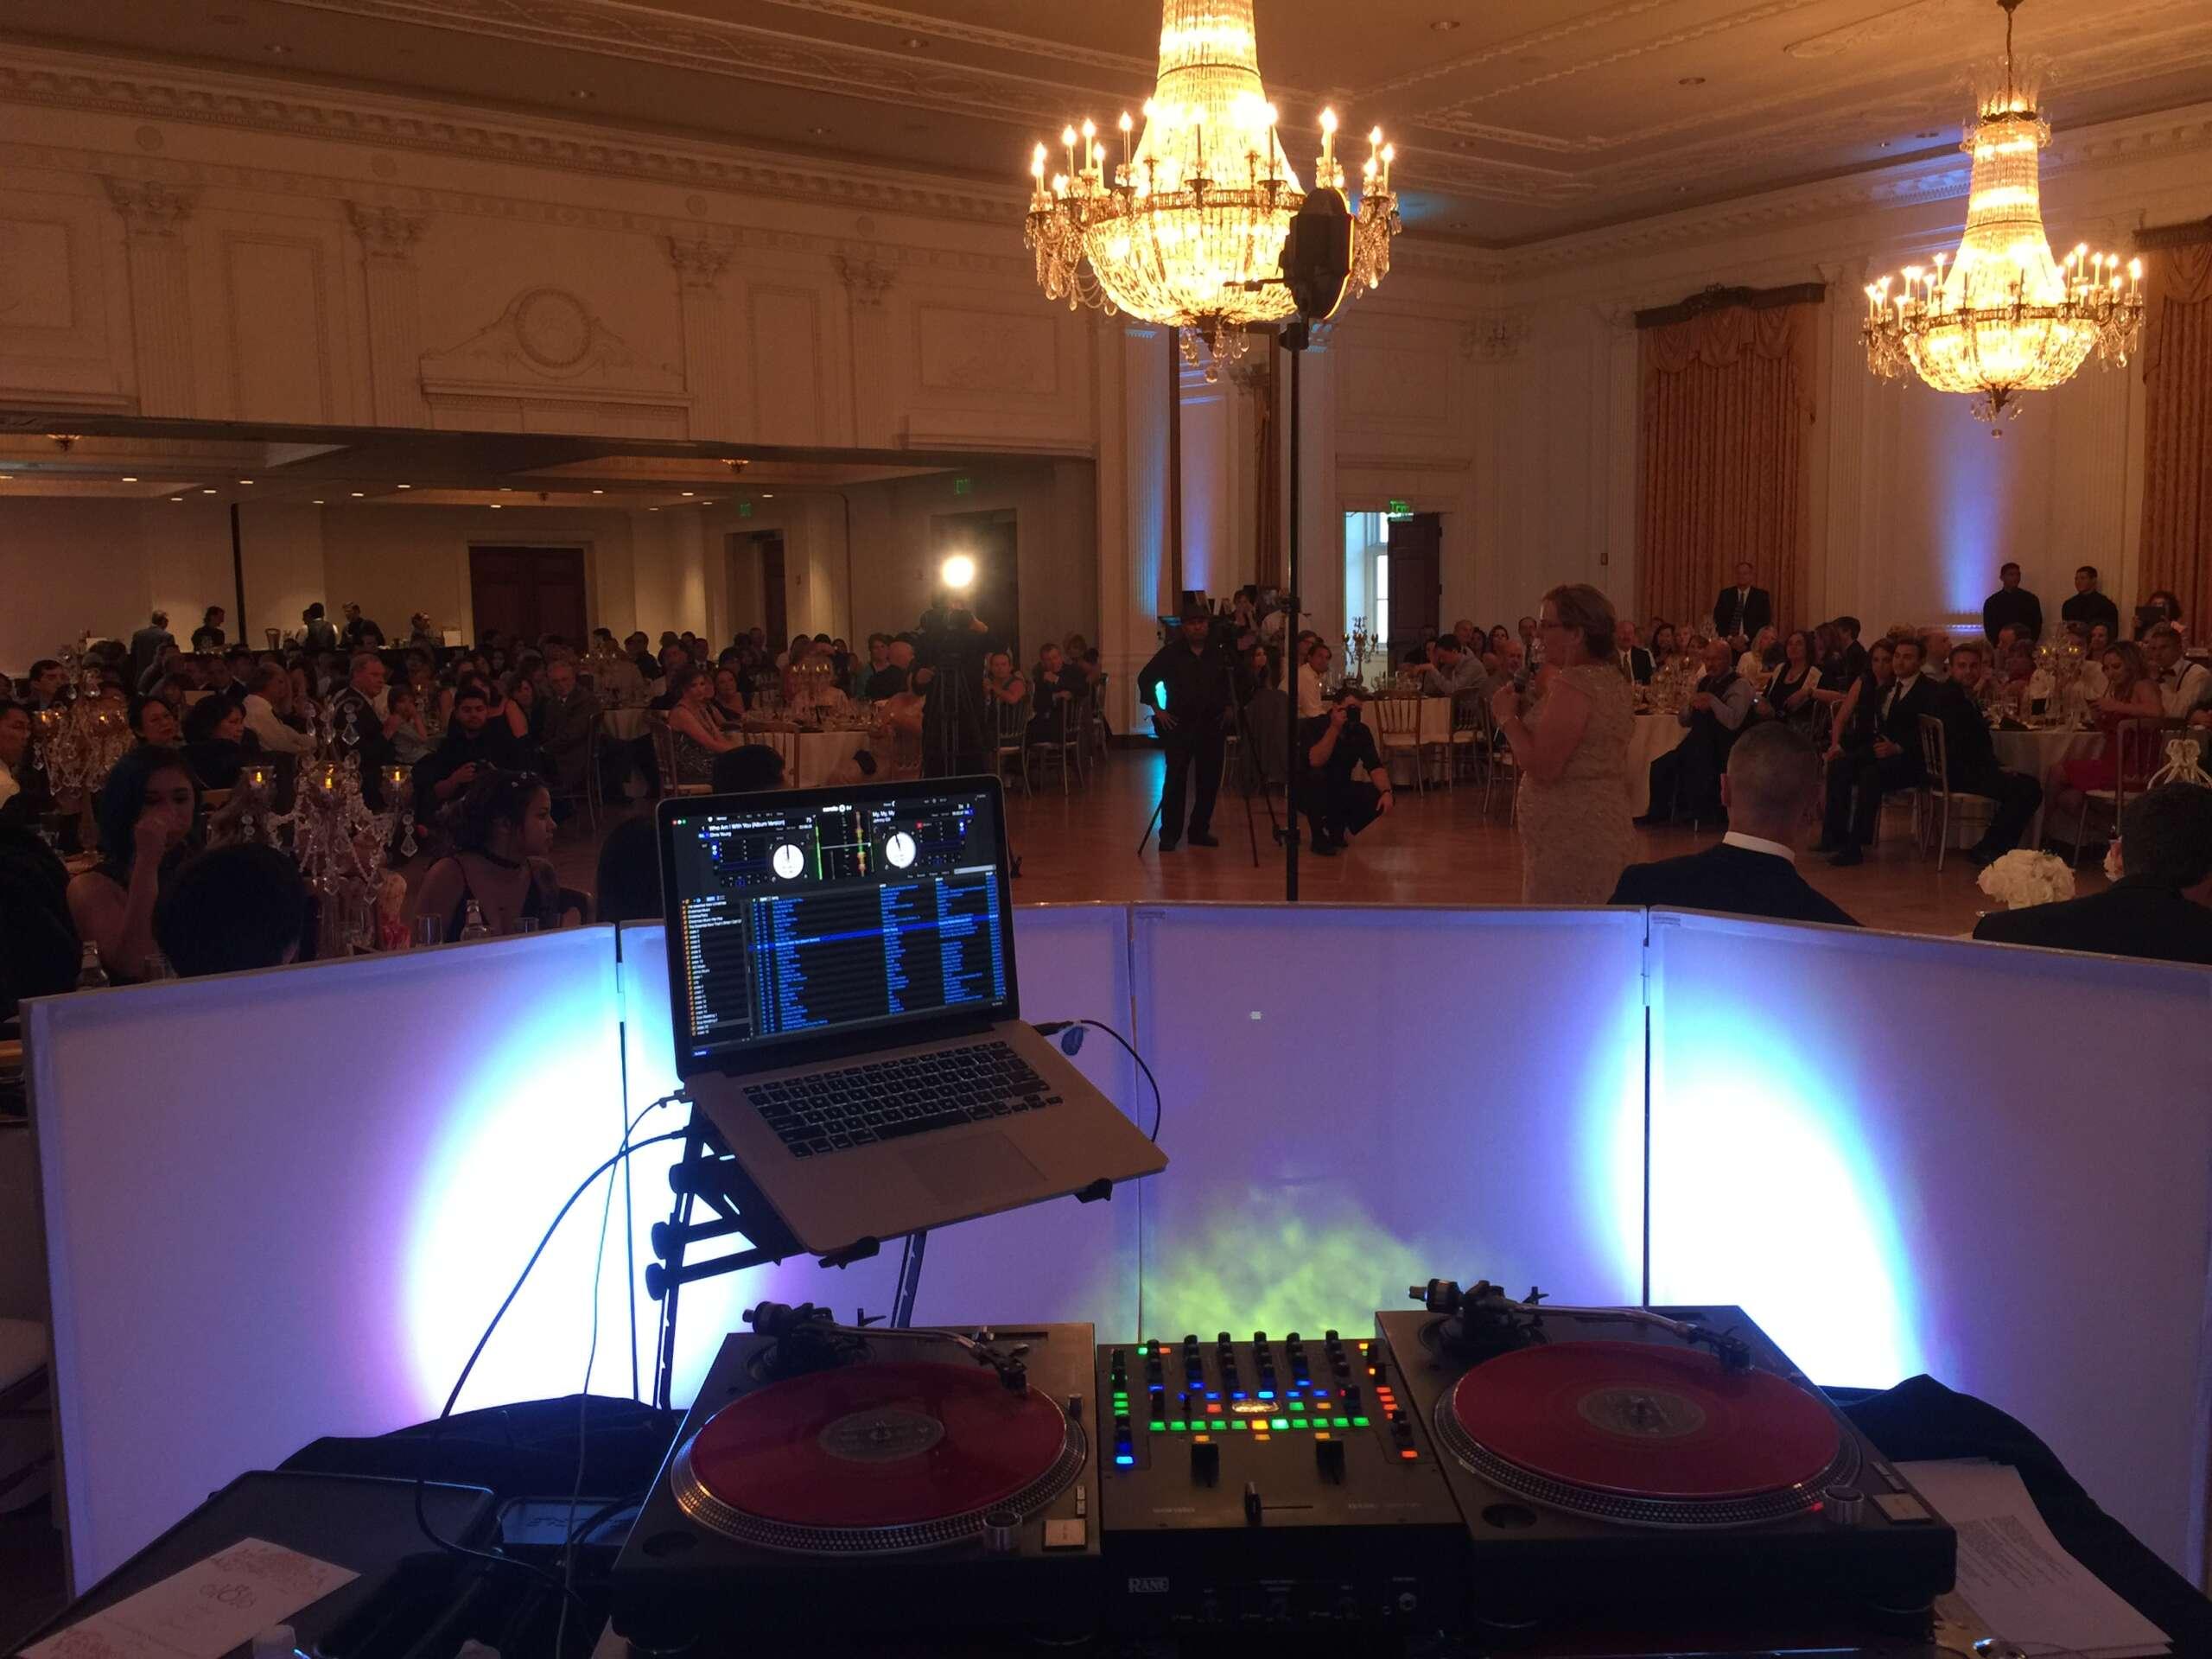 Wedding DJ Costa Mesa Orange County DJ Hustle Events Entertainment DJ Service